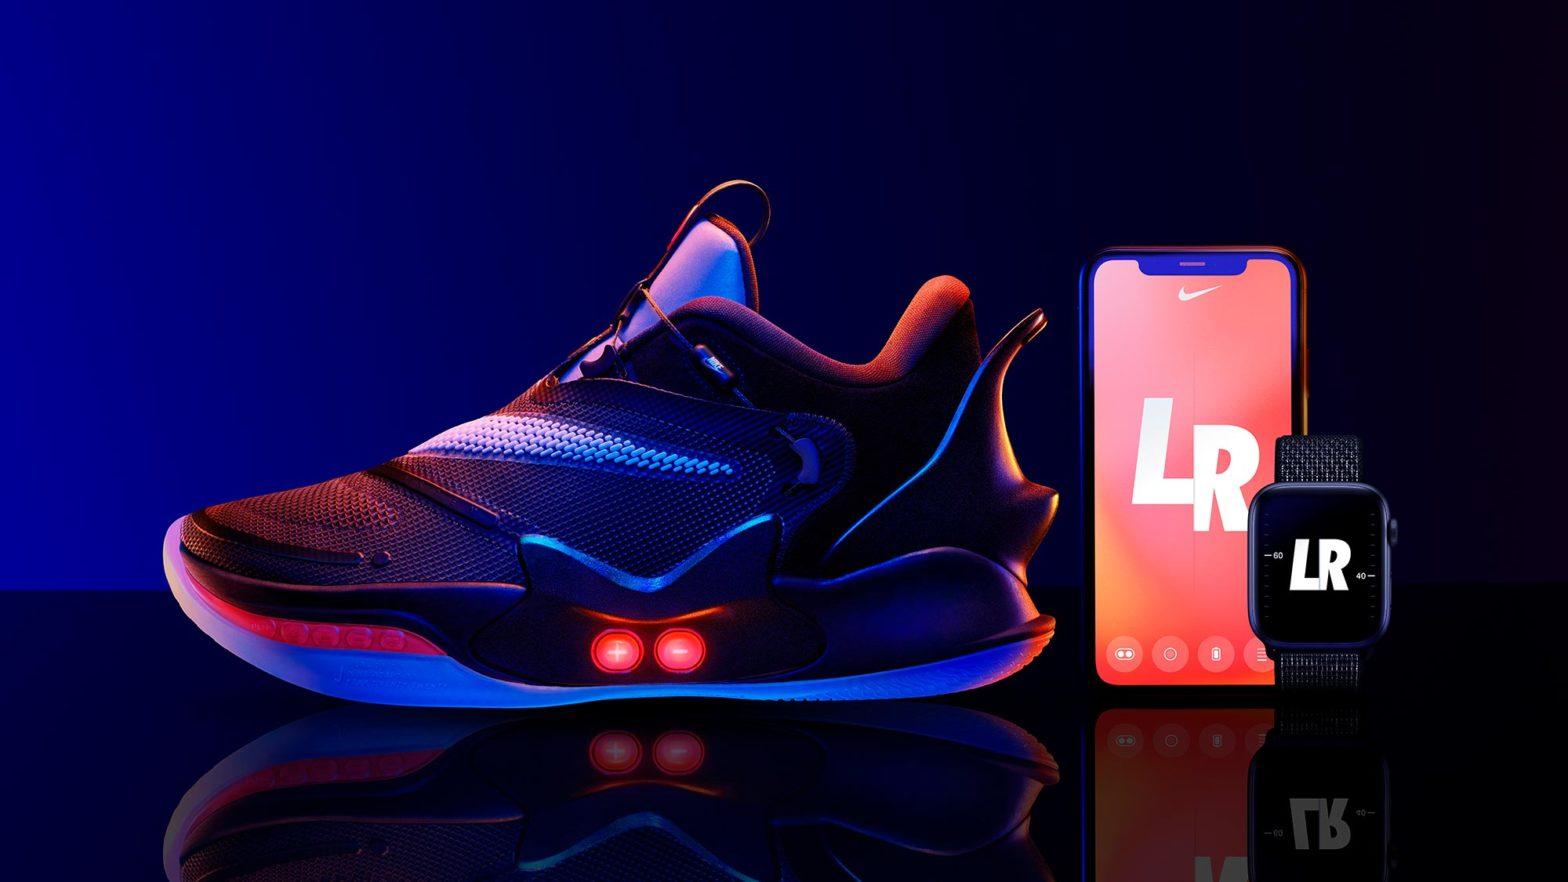 Nike Adapt BB 2.0 Self-lacing Basketball Shoes